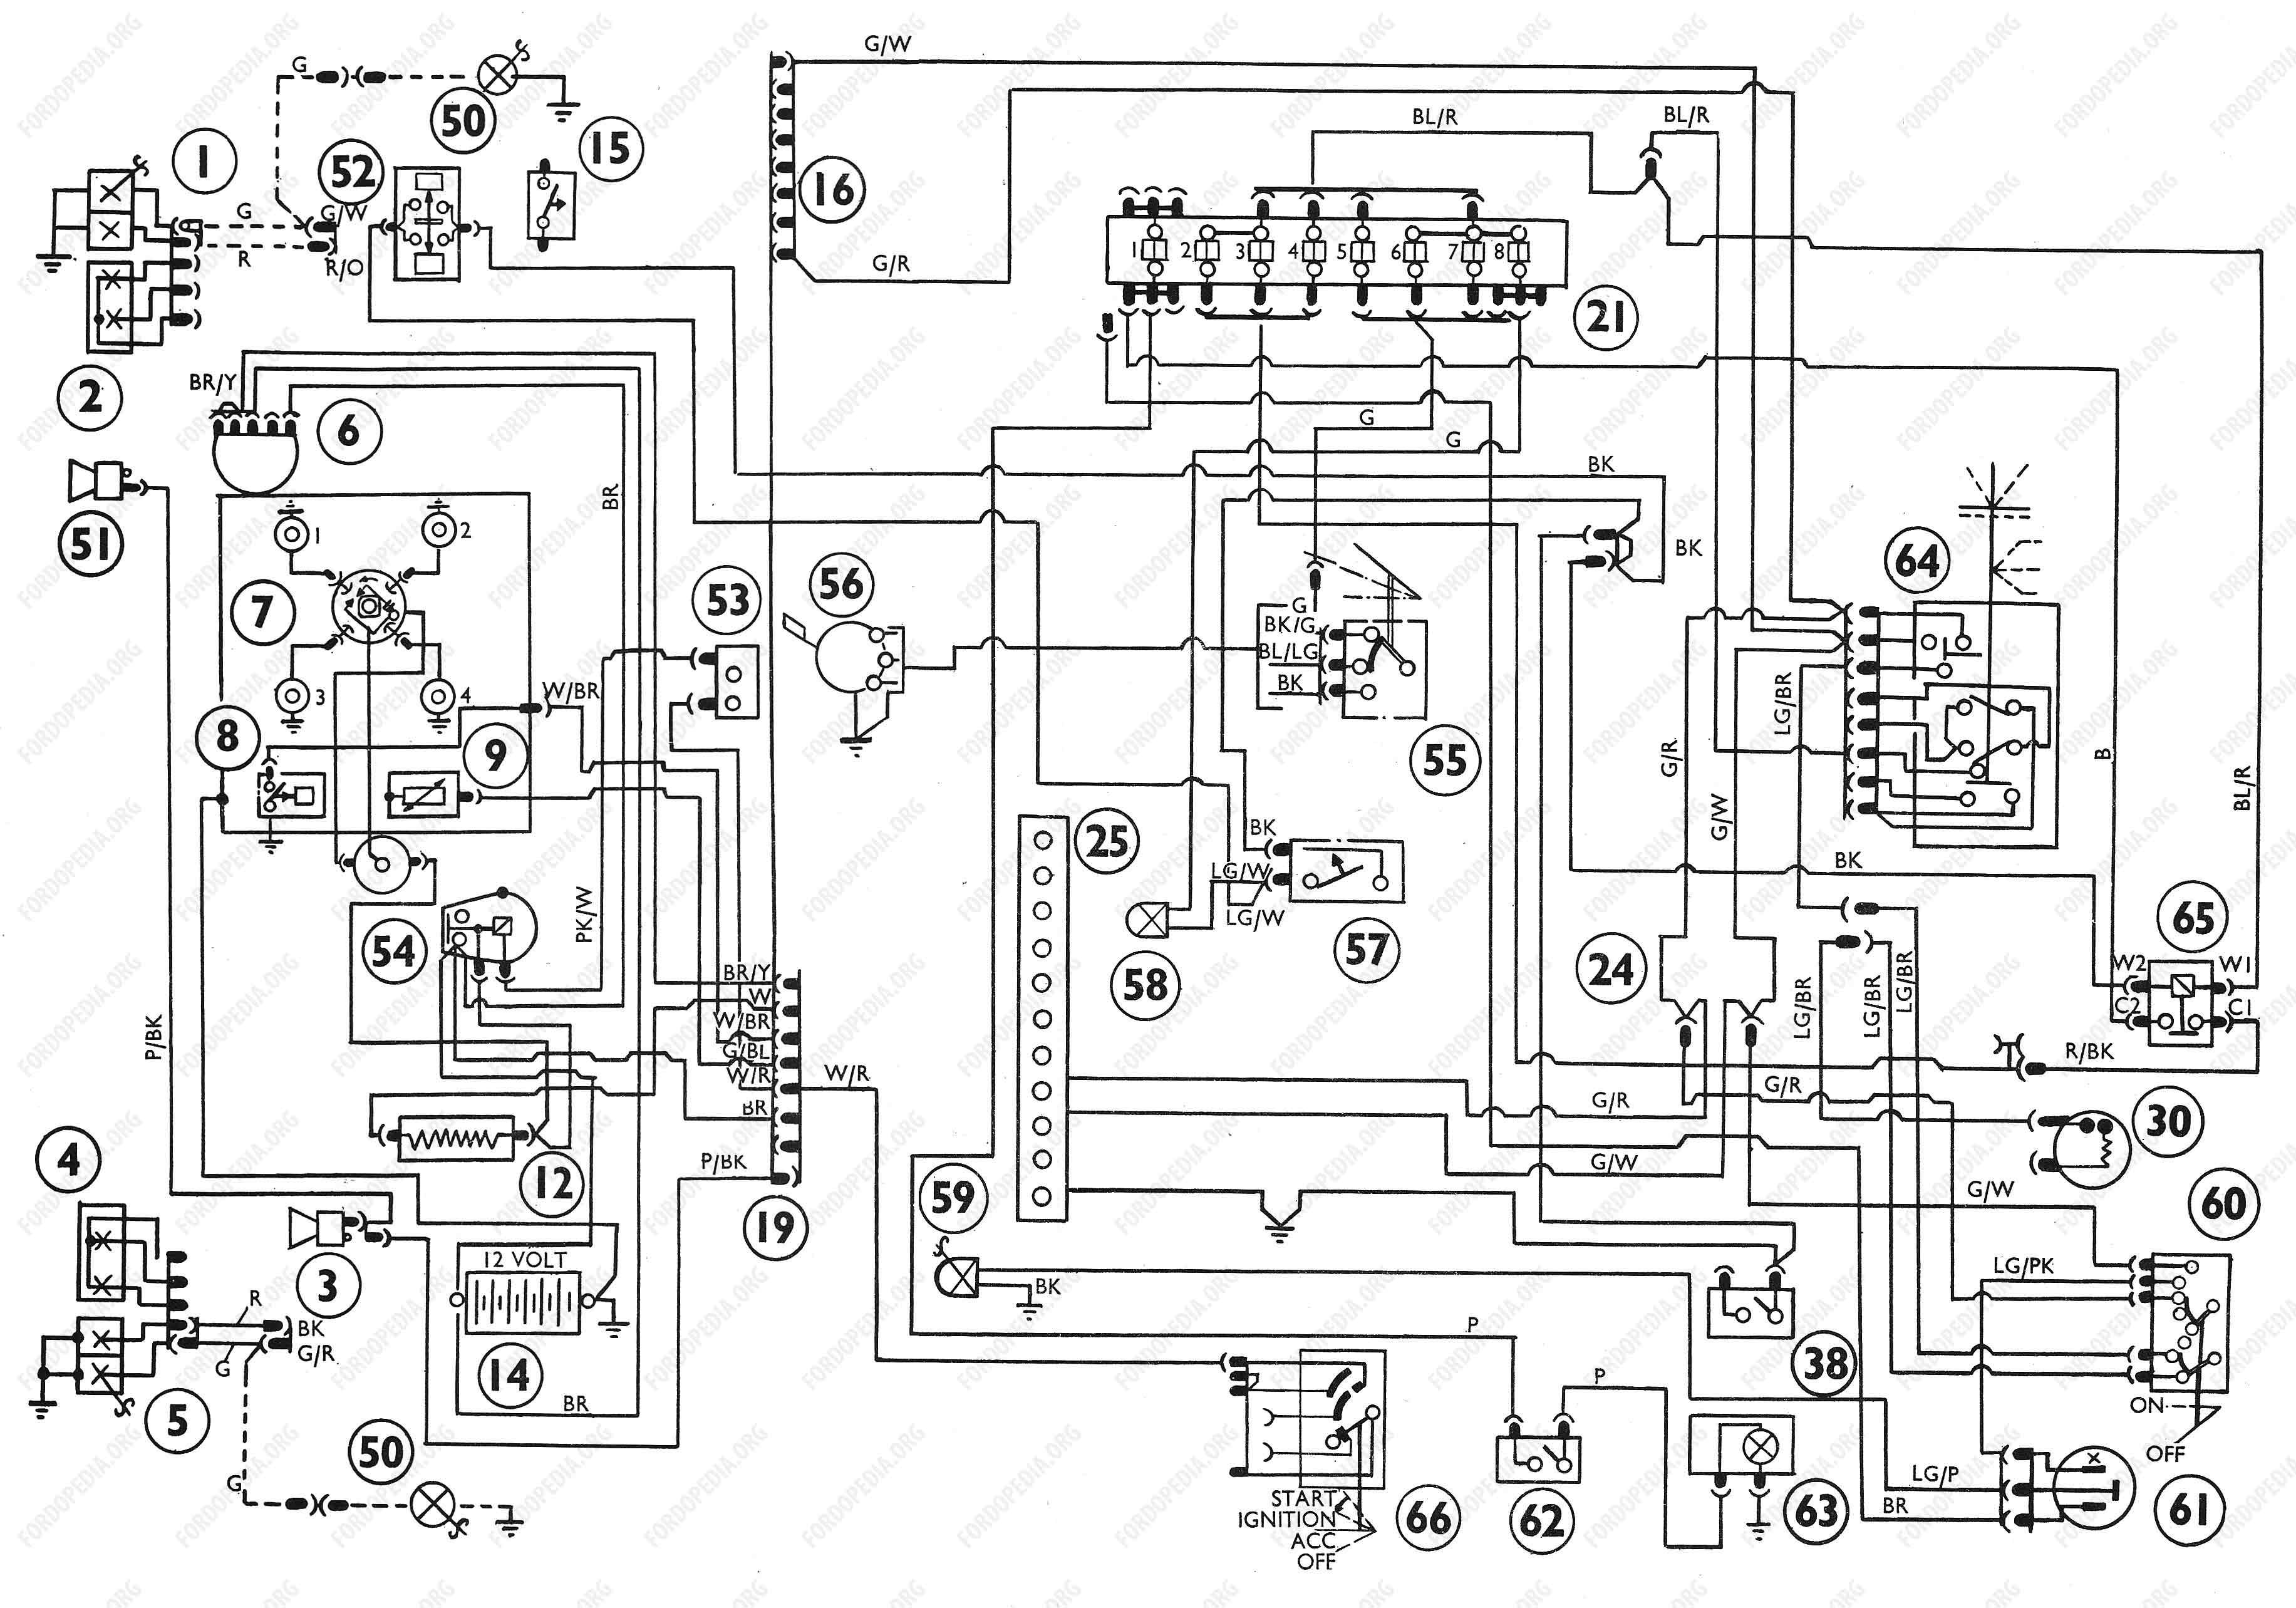 Harley Davidson Electric Golf Cart Wiring Diagram 1968. Harley ... on harley-davidson oem parts diagram, harley wiring diagrams pdf, harley-davidson electrical diagram, ezgo gas wiring diagram, westinghouse golf cart wiring diagram, club golf cart wiring diagram, cushman golf cart 36 volt wiring diagram, ez go wiring harness diagram, club car wiring diagram, golf cart battery wiring diagram, columbia gas golf cart wiring diagram, taylor dunn golf cart wiring diagram, columbia par car wiring diagram, hyundai golf cart wiring diagram, gem golf cart wiring diagram, golf cart motor wiring diagram, harley wiring harness diagram, harley wiring diagram for dummies, golf cart starter generator wiring diagram,